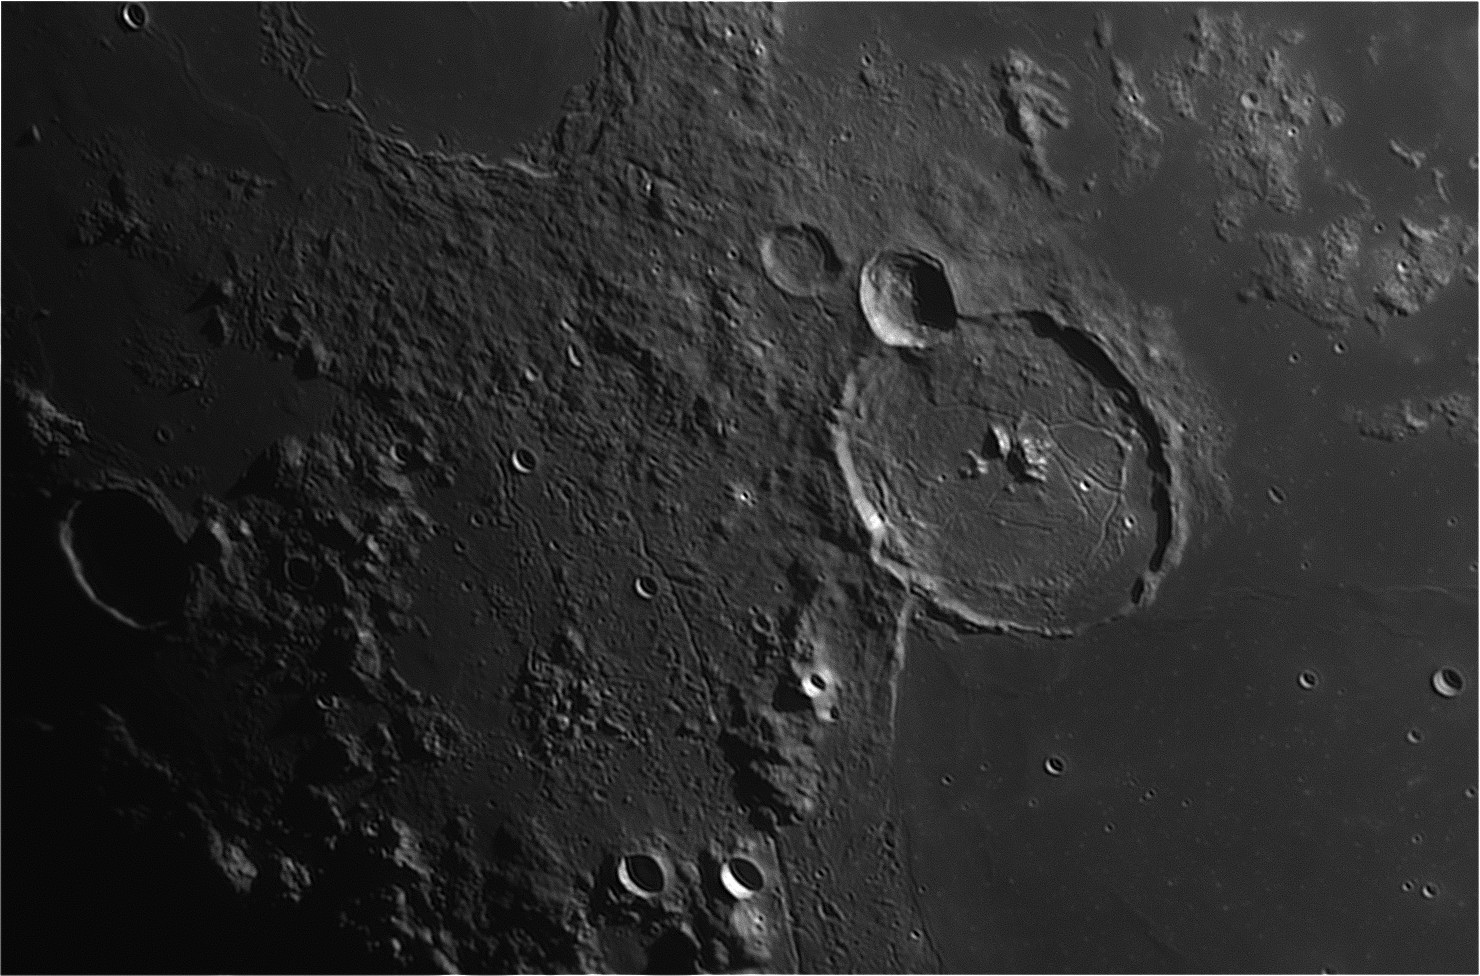 Moon_210423_201856_W23A_AS_F1200_lapl5_ap207.jpg.bc16d510a240297b610f25b5de7a41cc.jpg